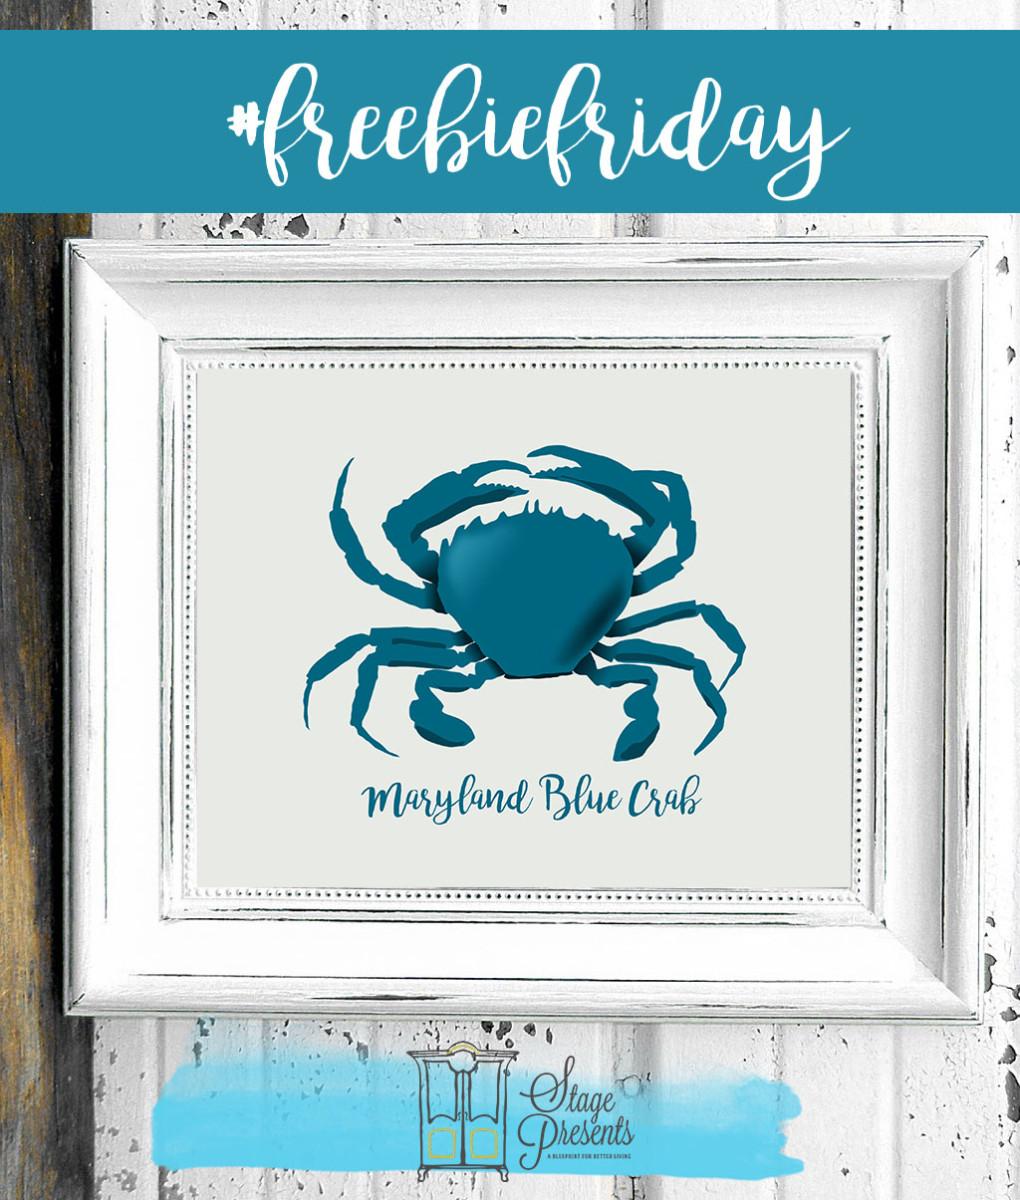 Freebie Friday - Maryland Blue Crab - Beach Printable - ©2016 Stage Presents